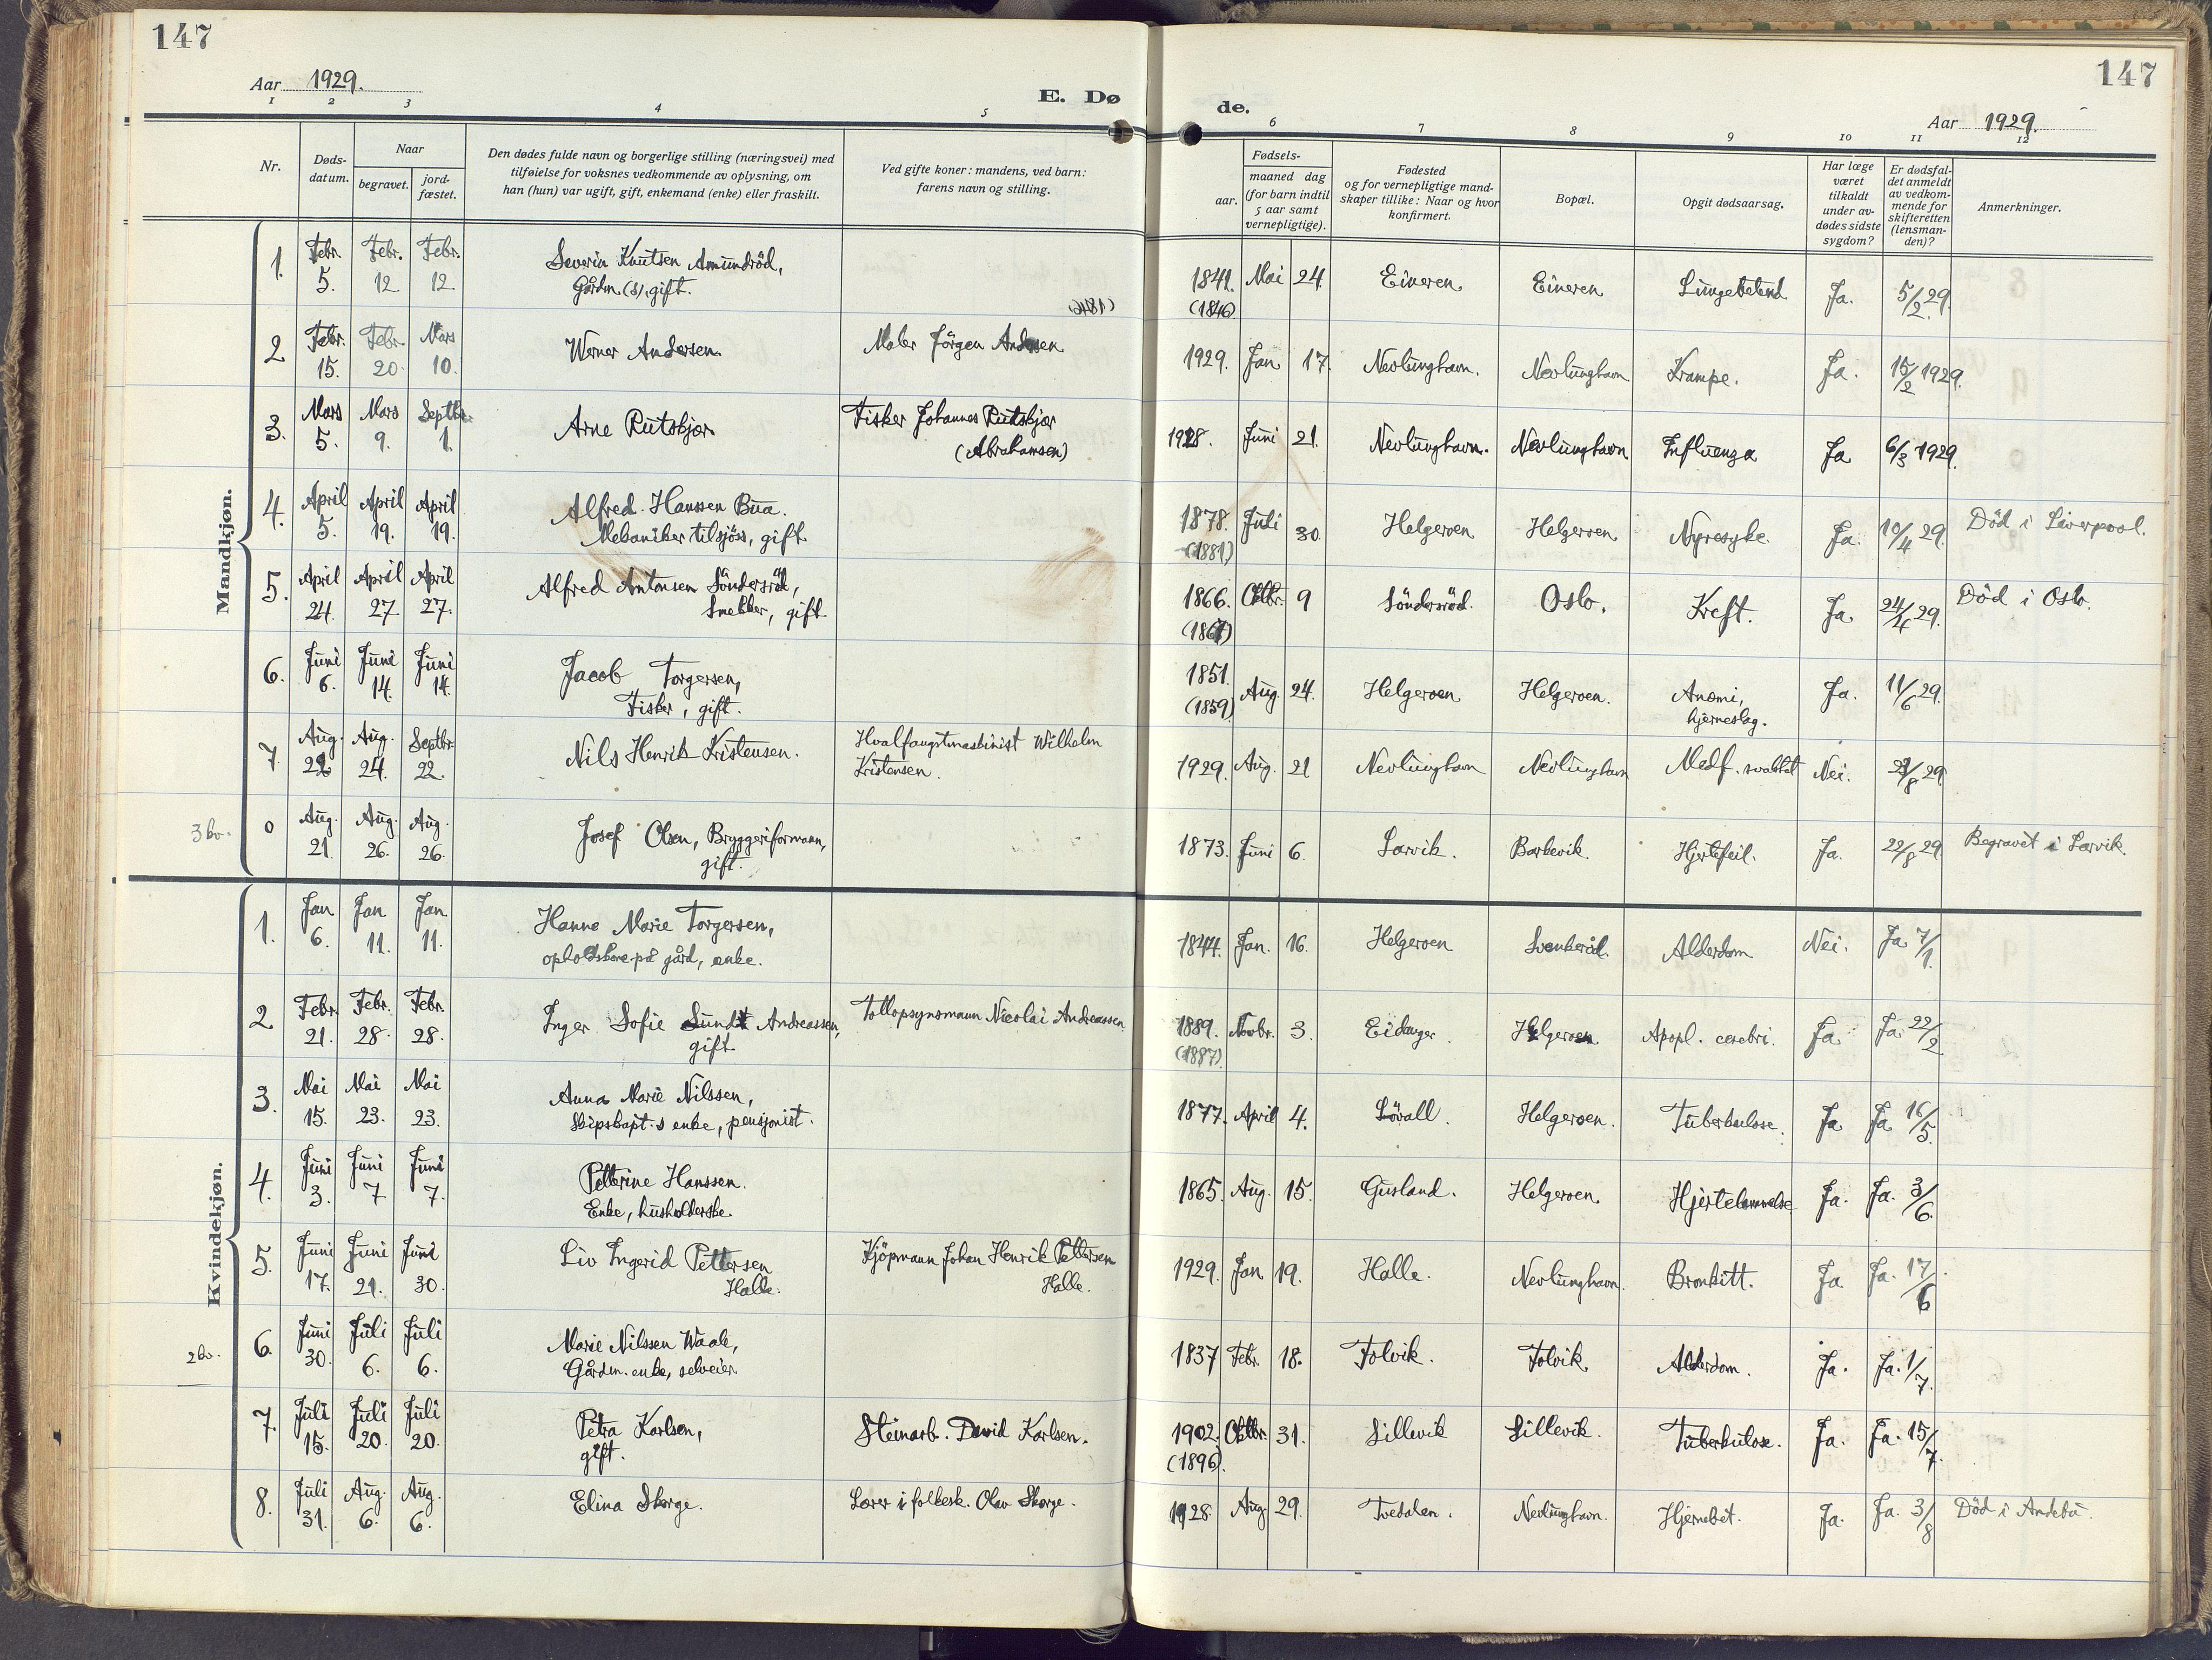 SAKO, Brunlanes kirkebøker, F/Fb/L0004: Ministerialbok nr. II 4, 1923-1940, s. 147